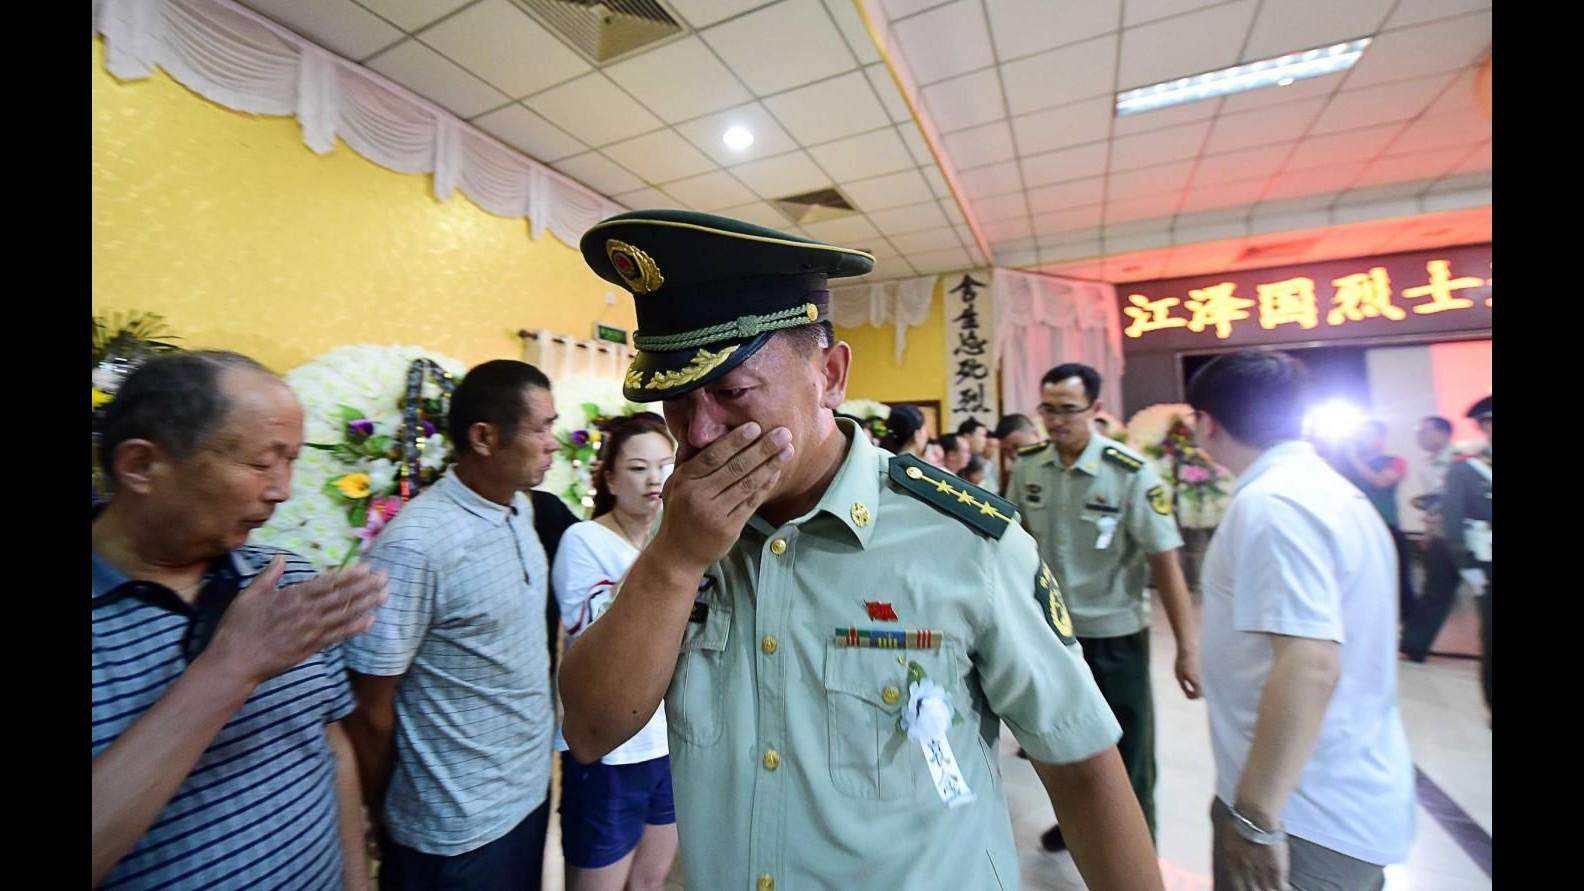 Cina, 12 arresti e 11 indagati per le esplosioni a Tianjin: morti saliti a 145